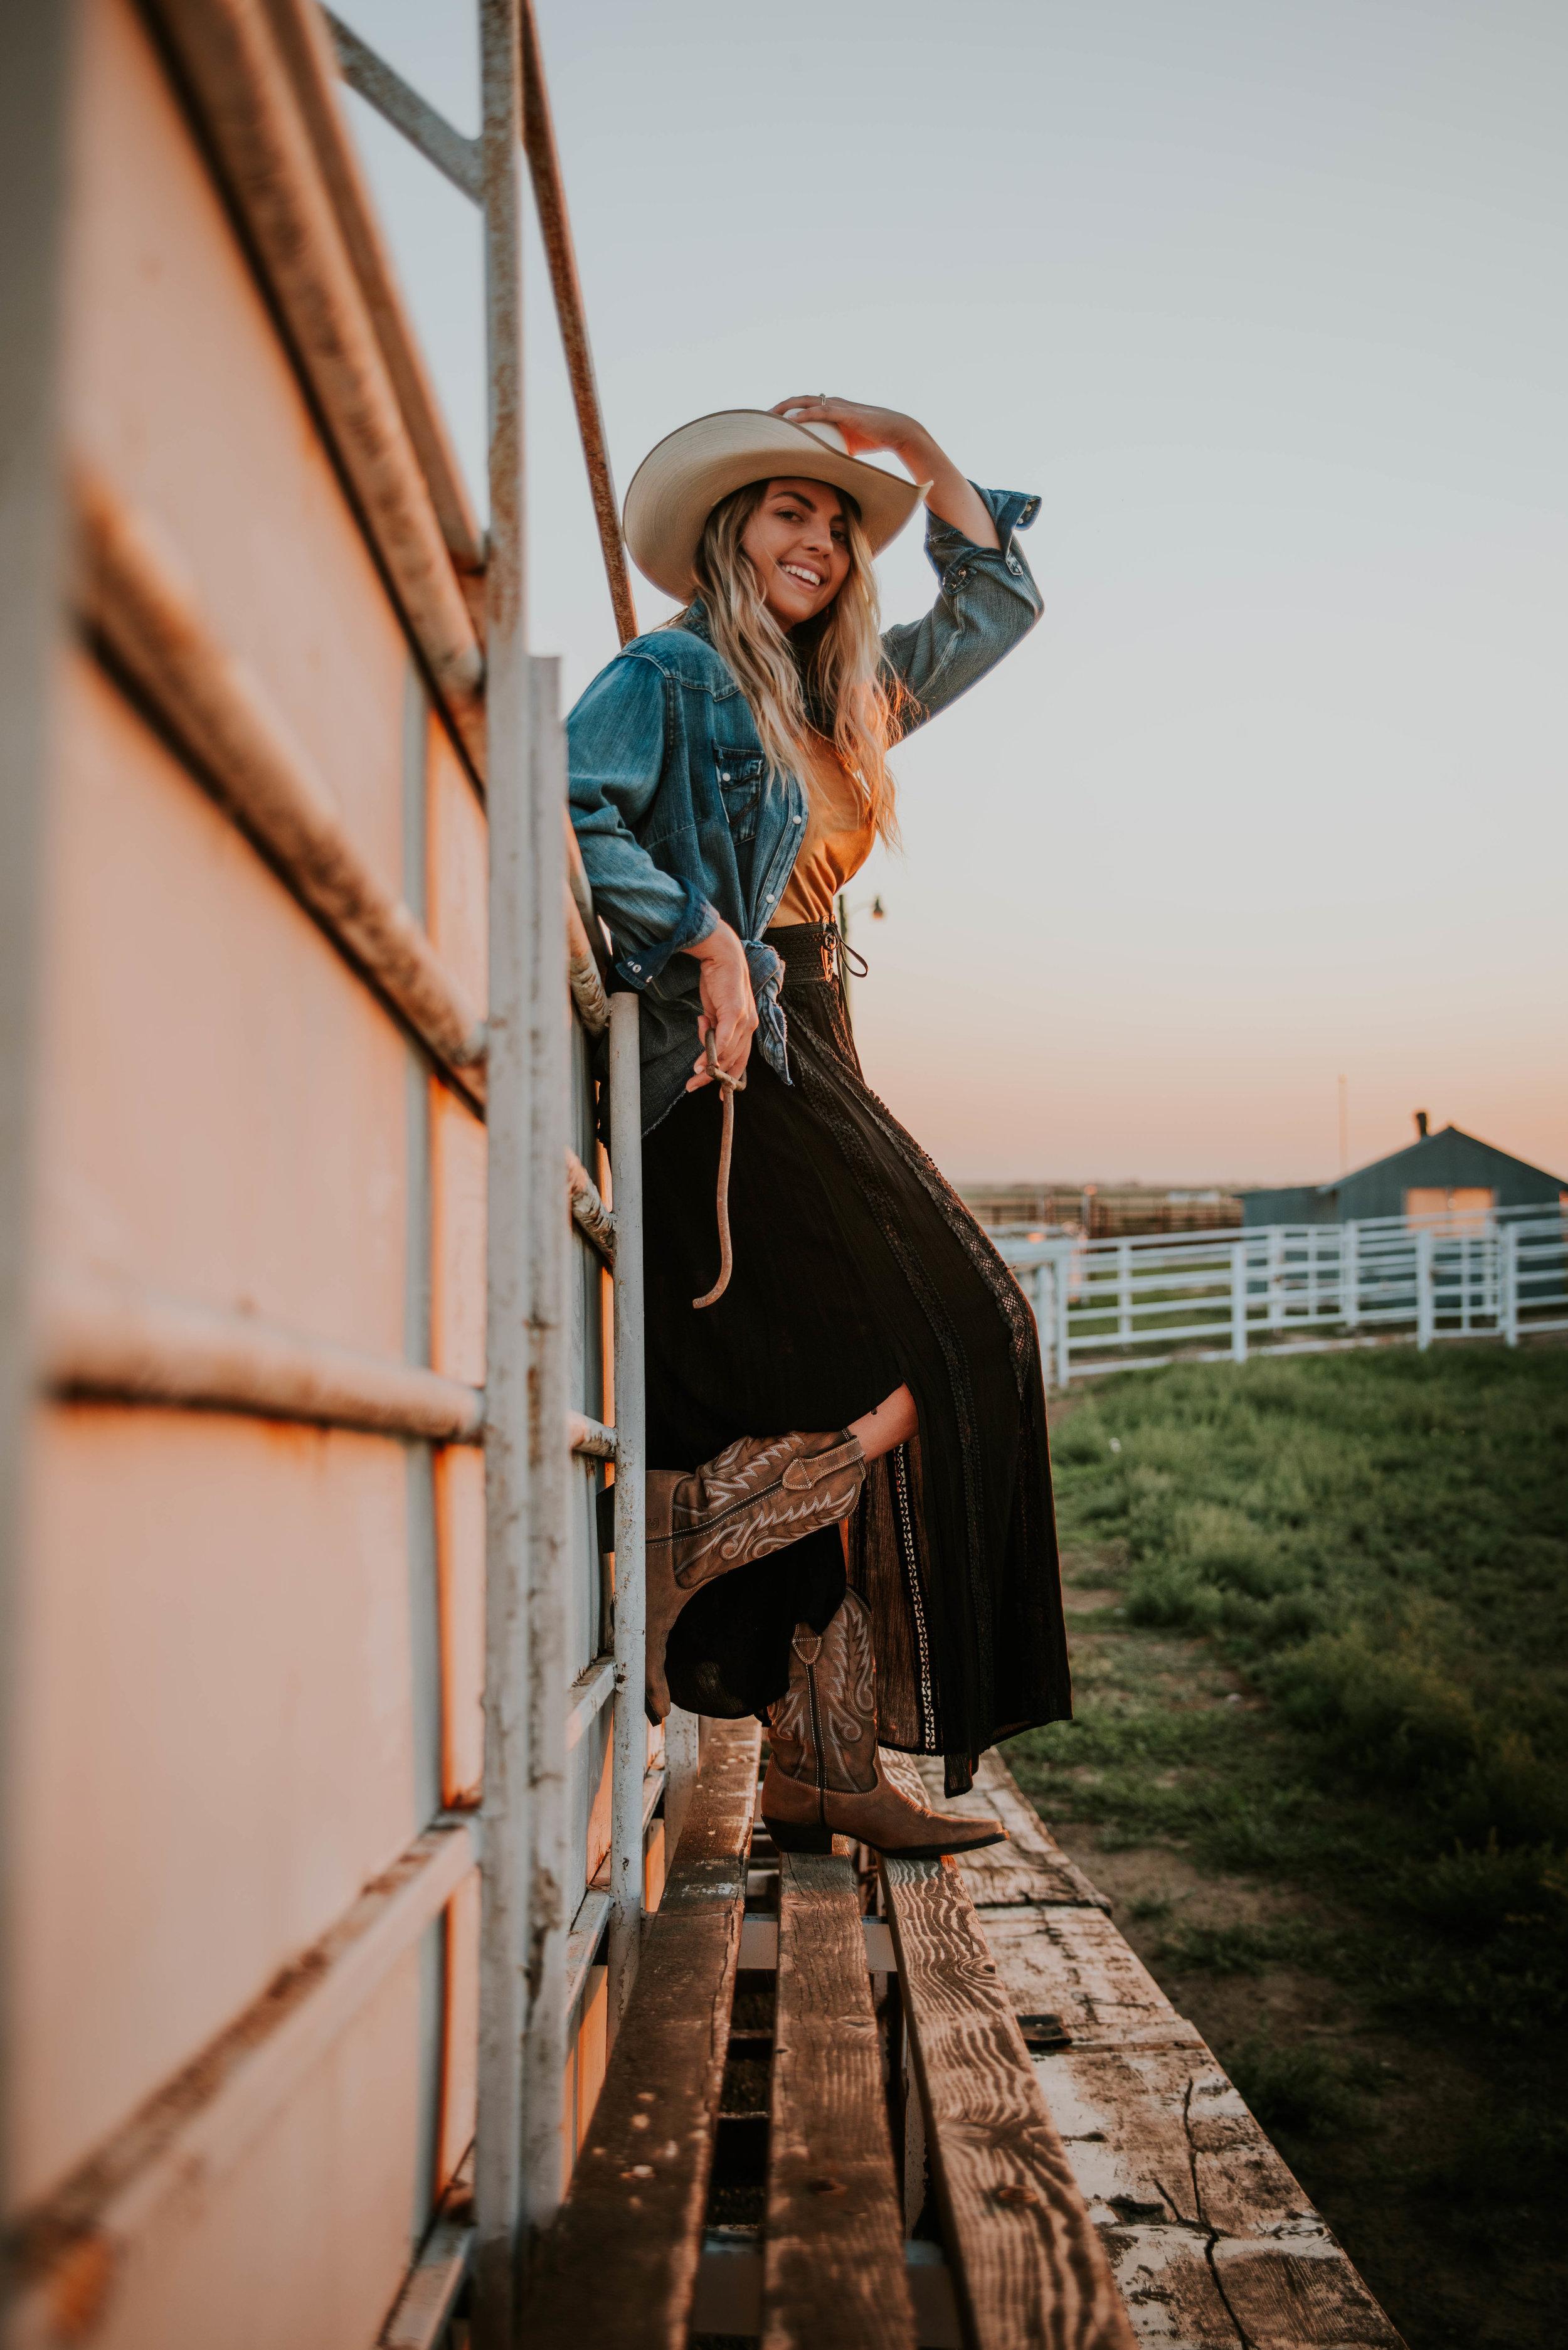 Miss. Miller's Photography | Colorado | Western Photo shoot | Western Fashion | Wrangler | Wrangler jacket | Black western skirt | black skirt | Boots and skirts | Boot fashion | Western Boot Fashion | Cowgirl Fashion | Durango Boots | Brown Durango Boots | Durango Dream Catchers